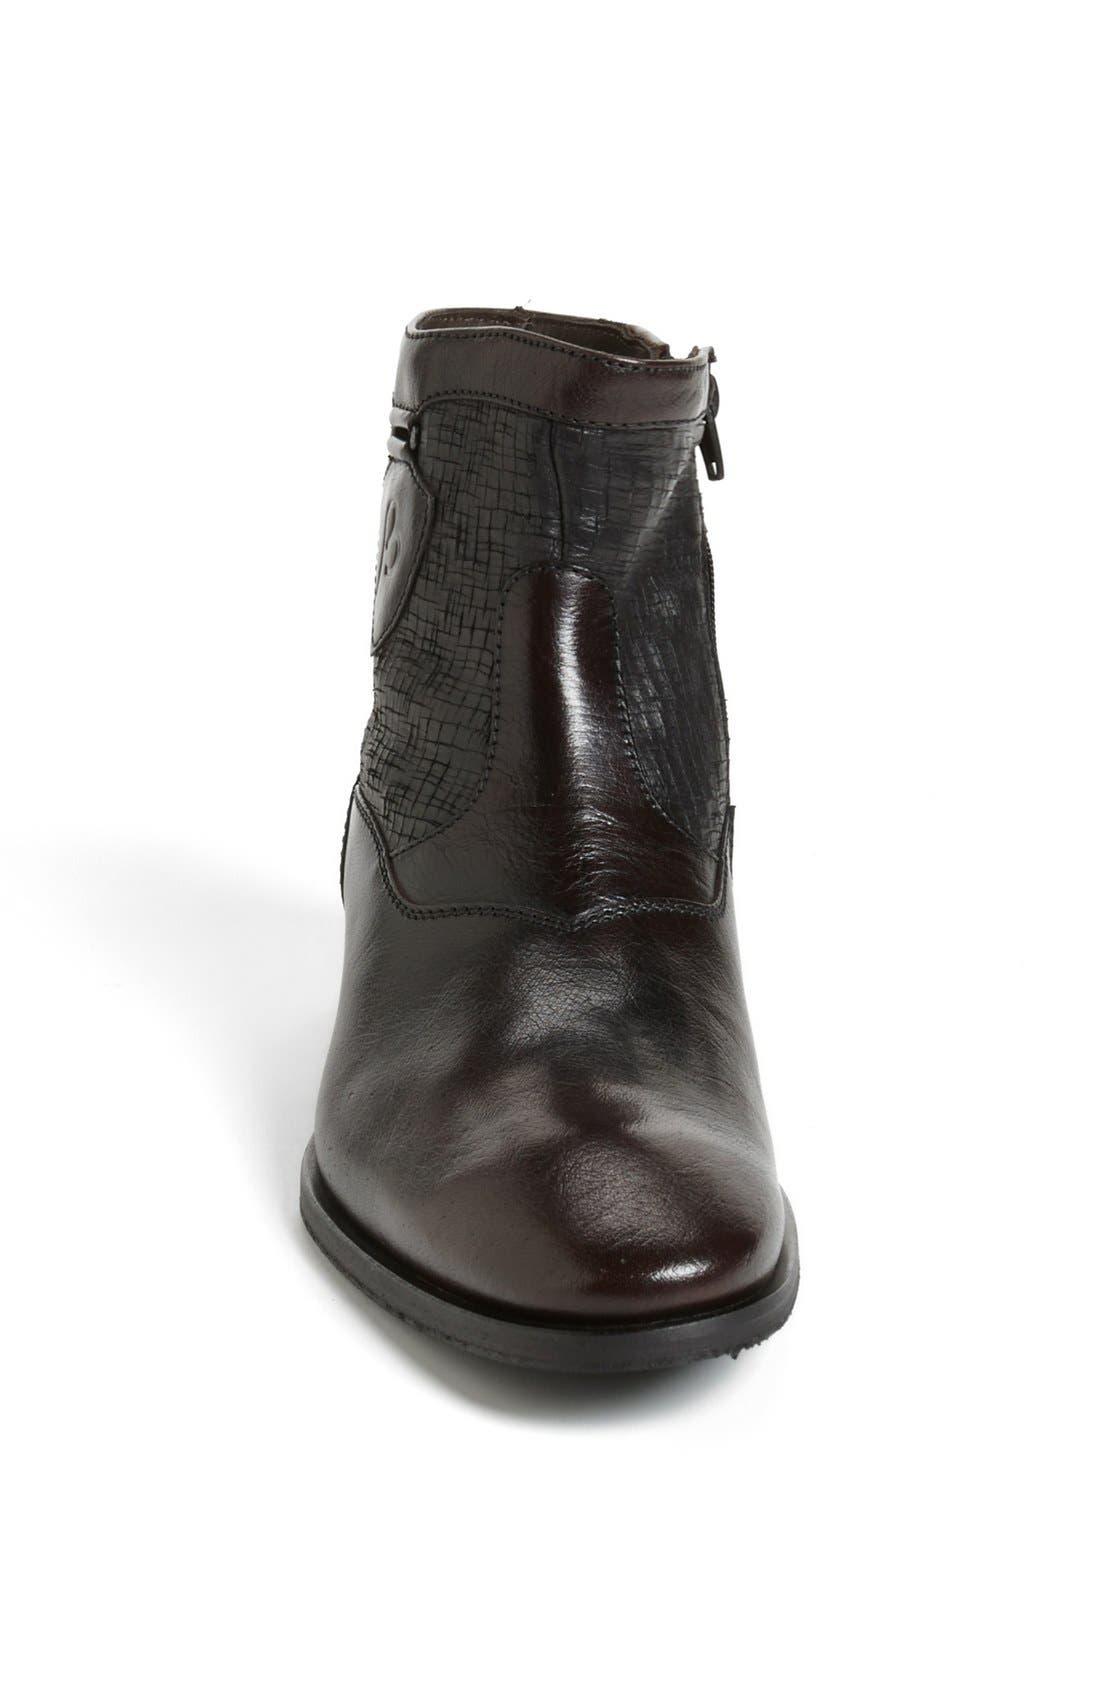 Alternate Image 3  - Bacco Bucci 'Devito' Zip boot (Men) (Online Only)